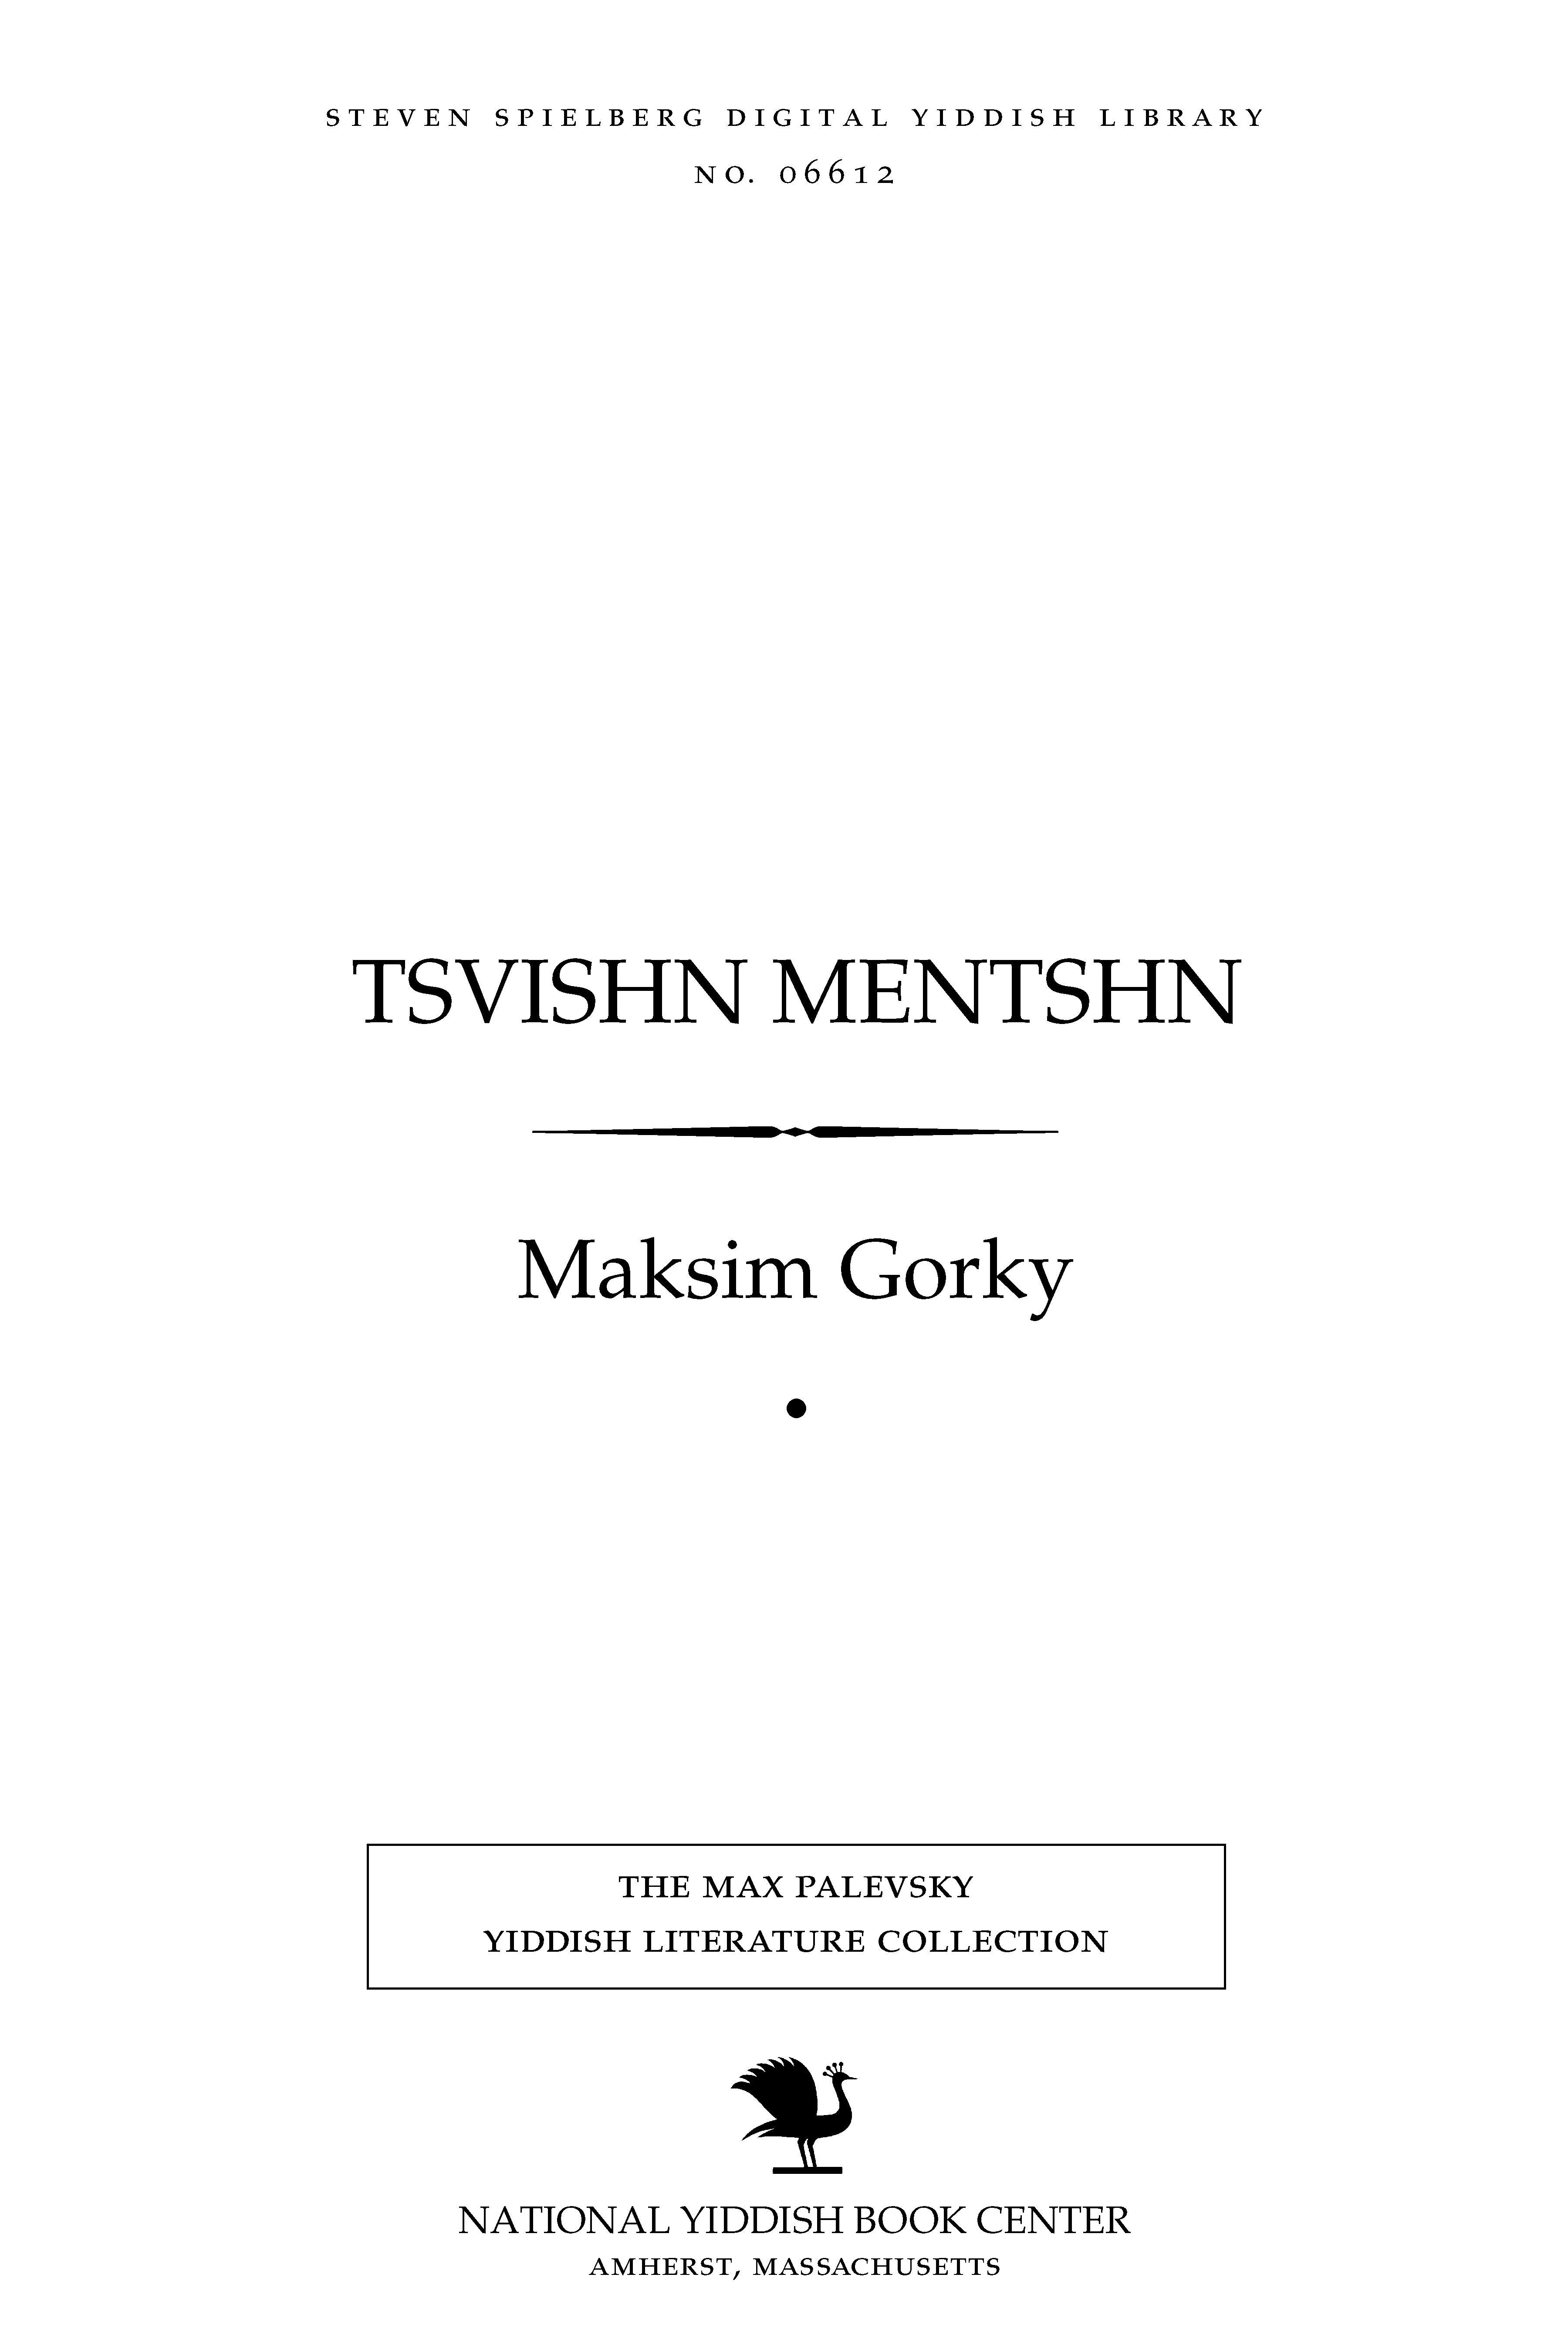 Cover of: Tsṿishn menṭshn